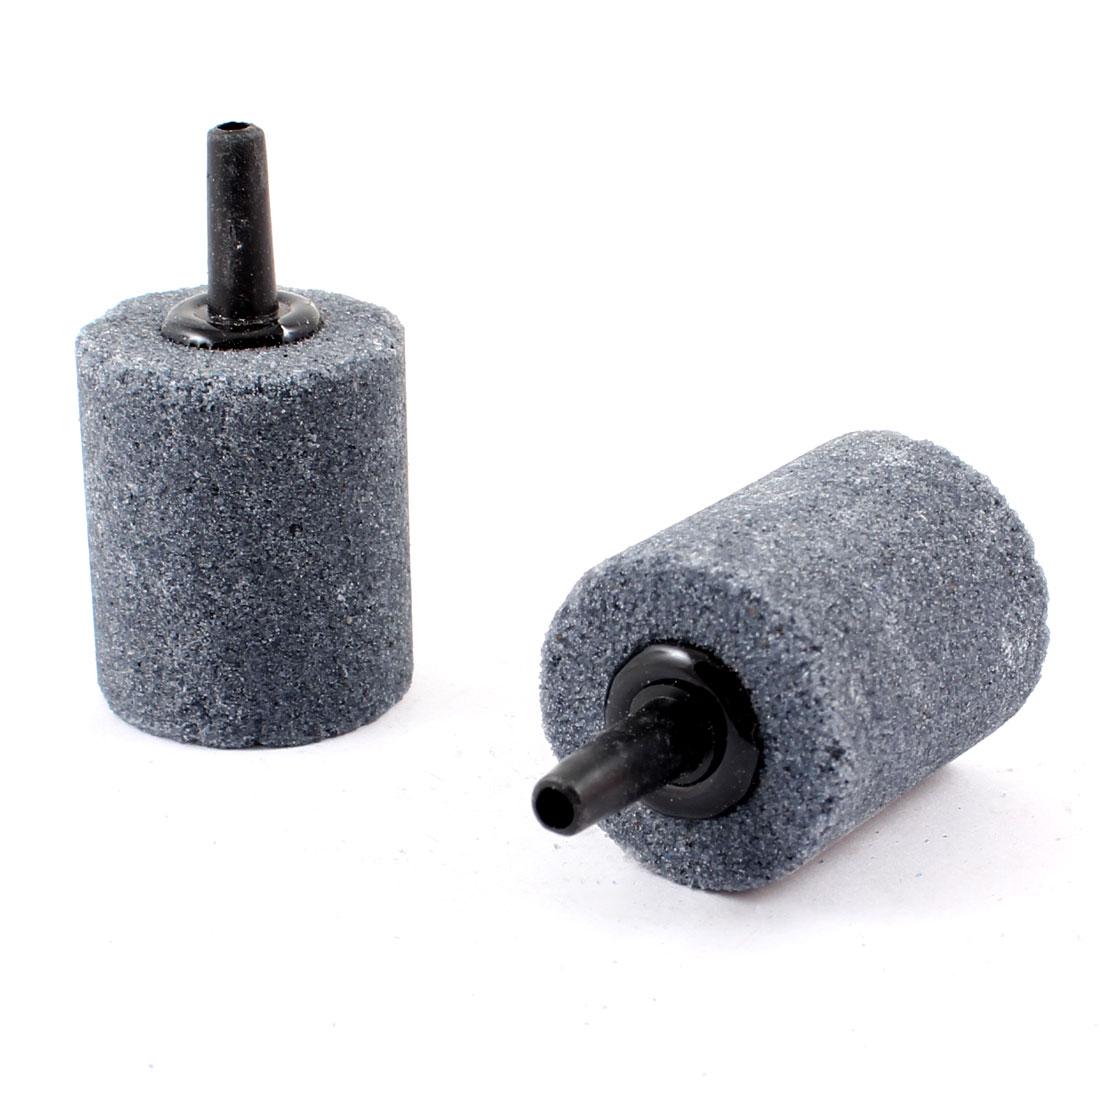 "2 Pcs 1"" x 1.2"" Cylindrical Air Stone for Aquarium Fish Tank"